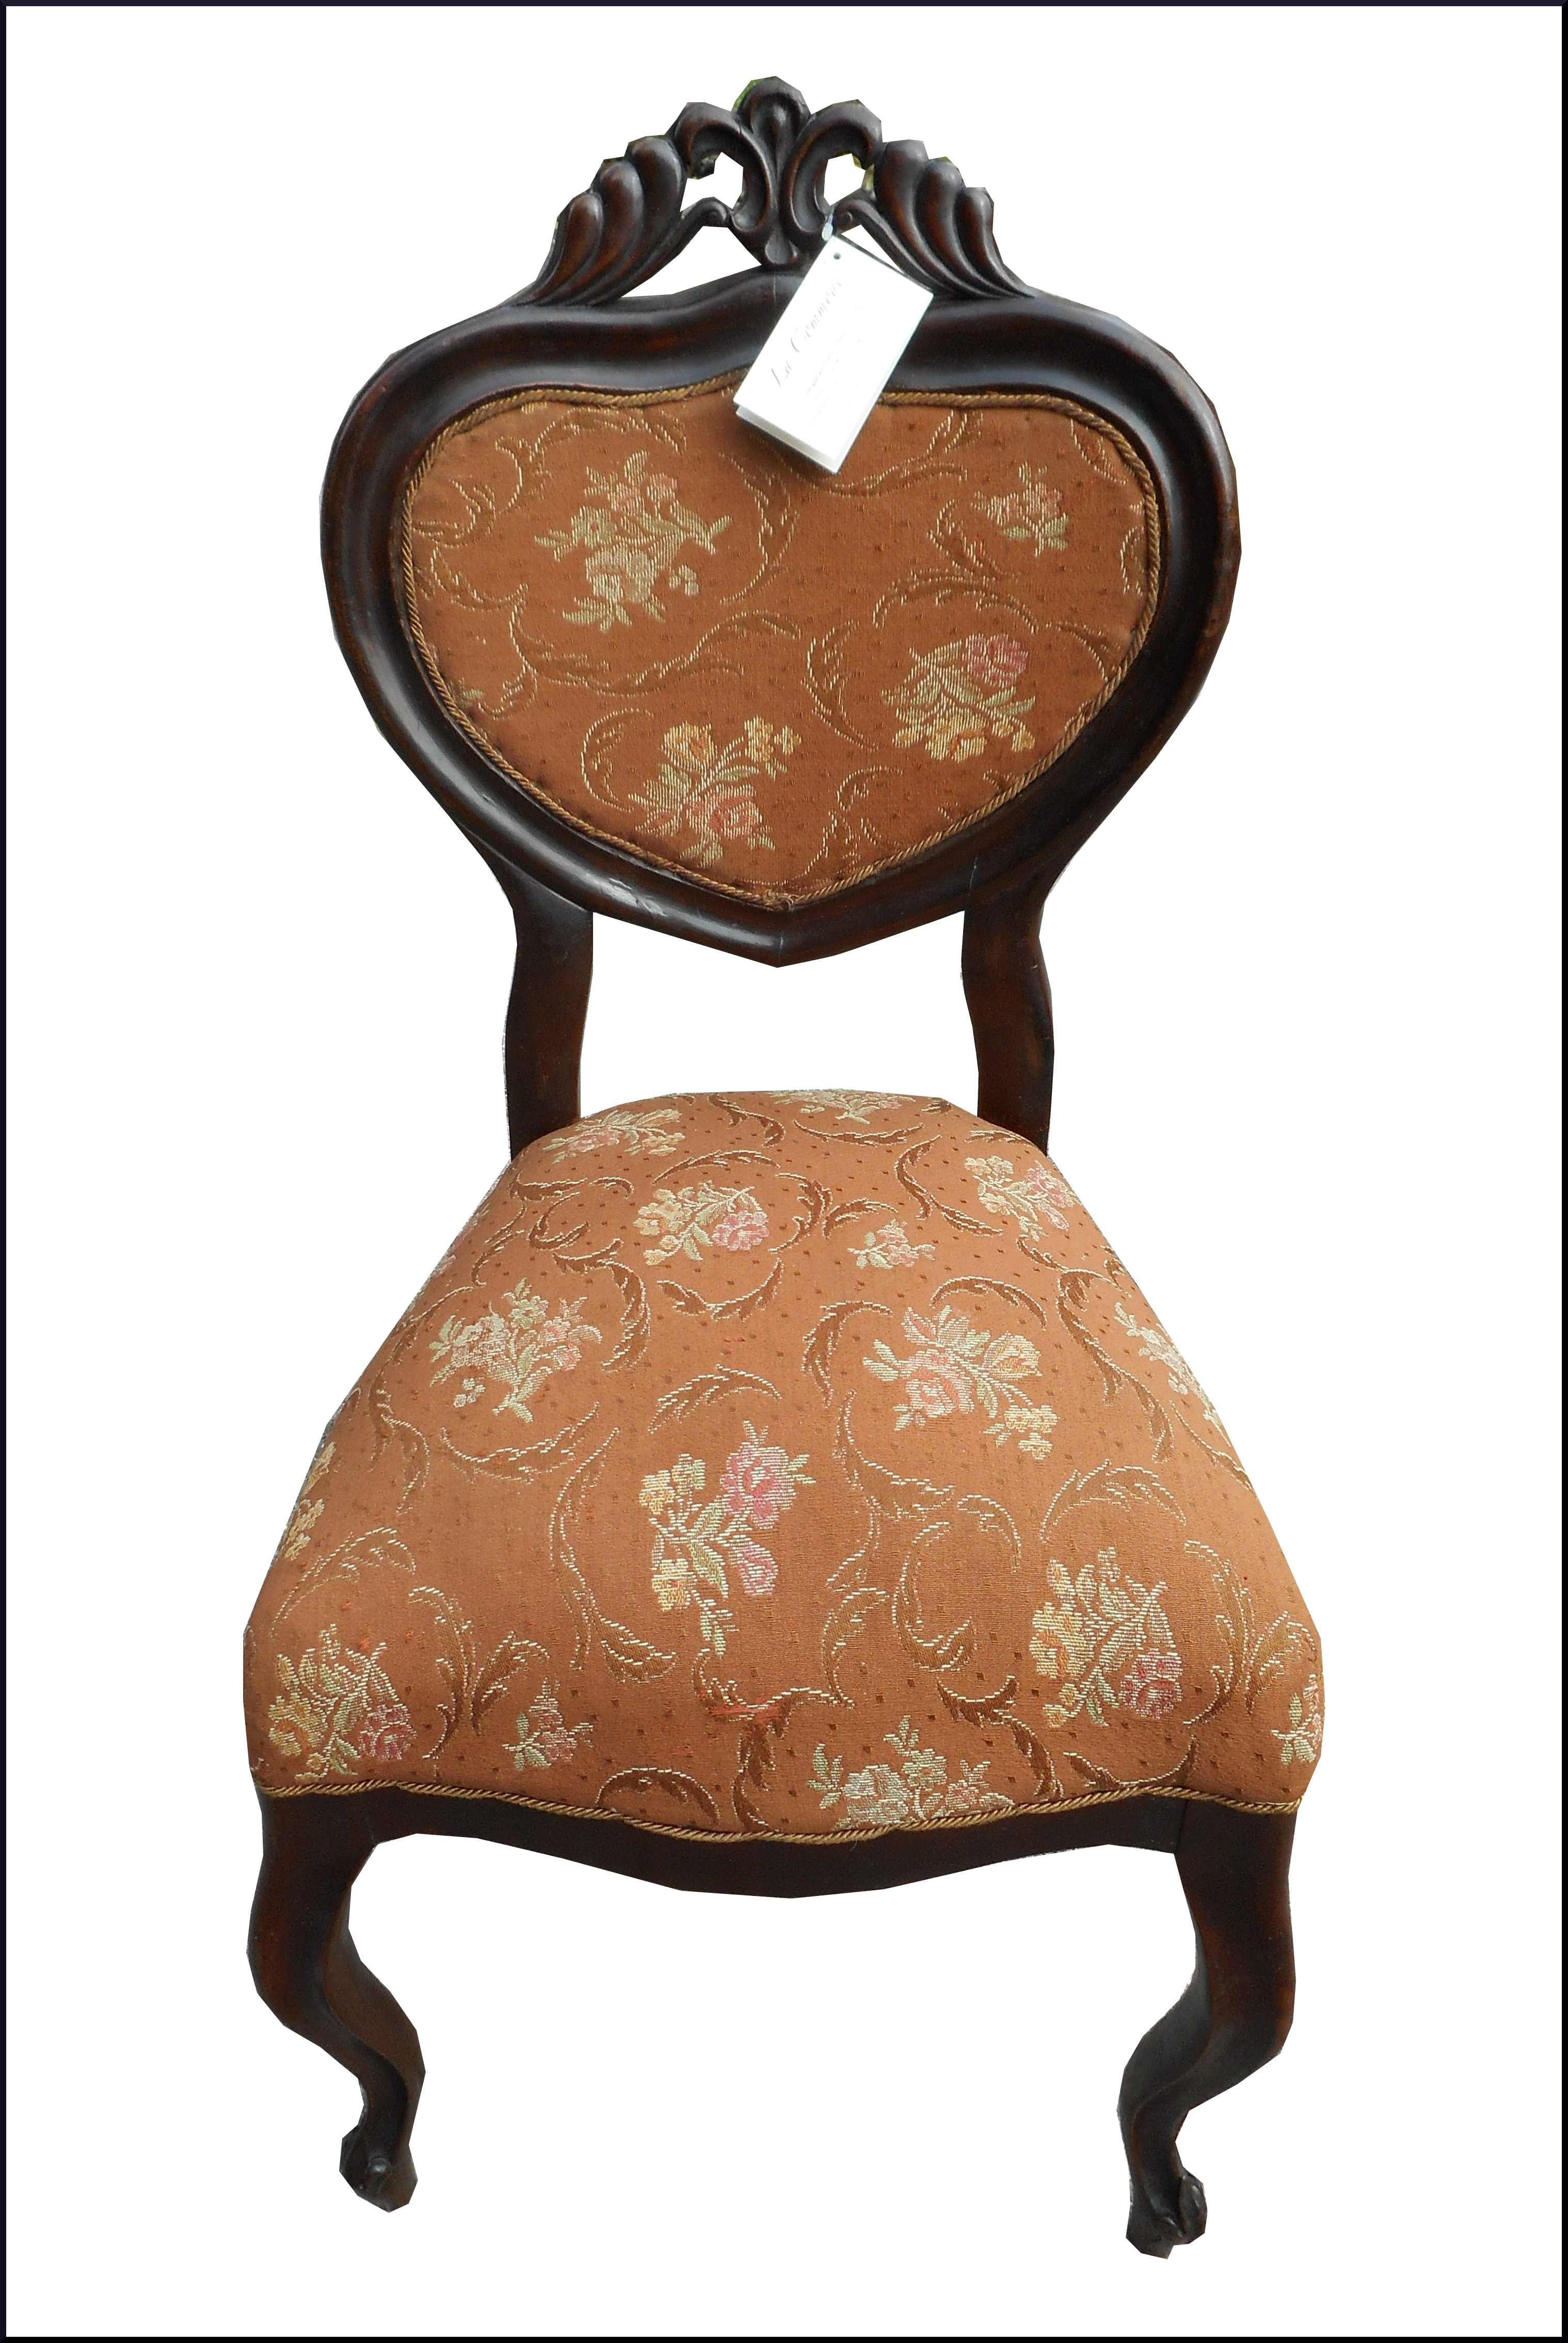 Antica sedia luigi filippo restaurata mobili antichi e d for Mobili d epoca